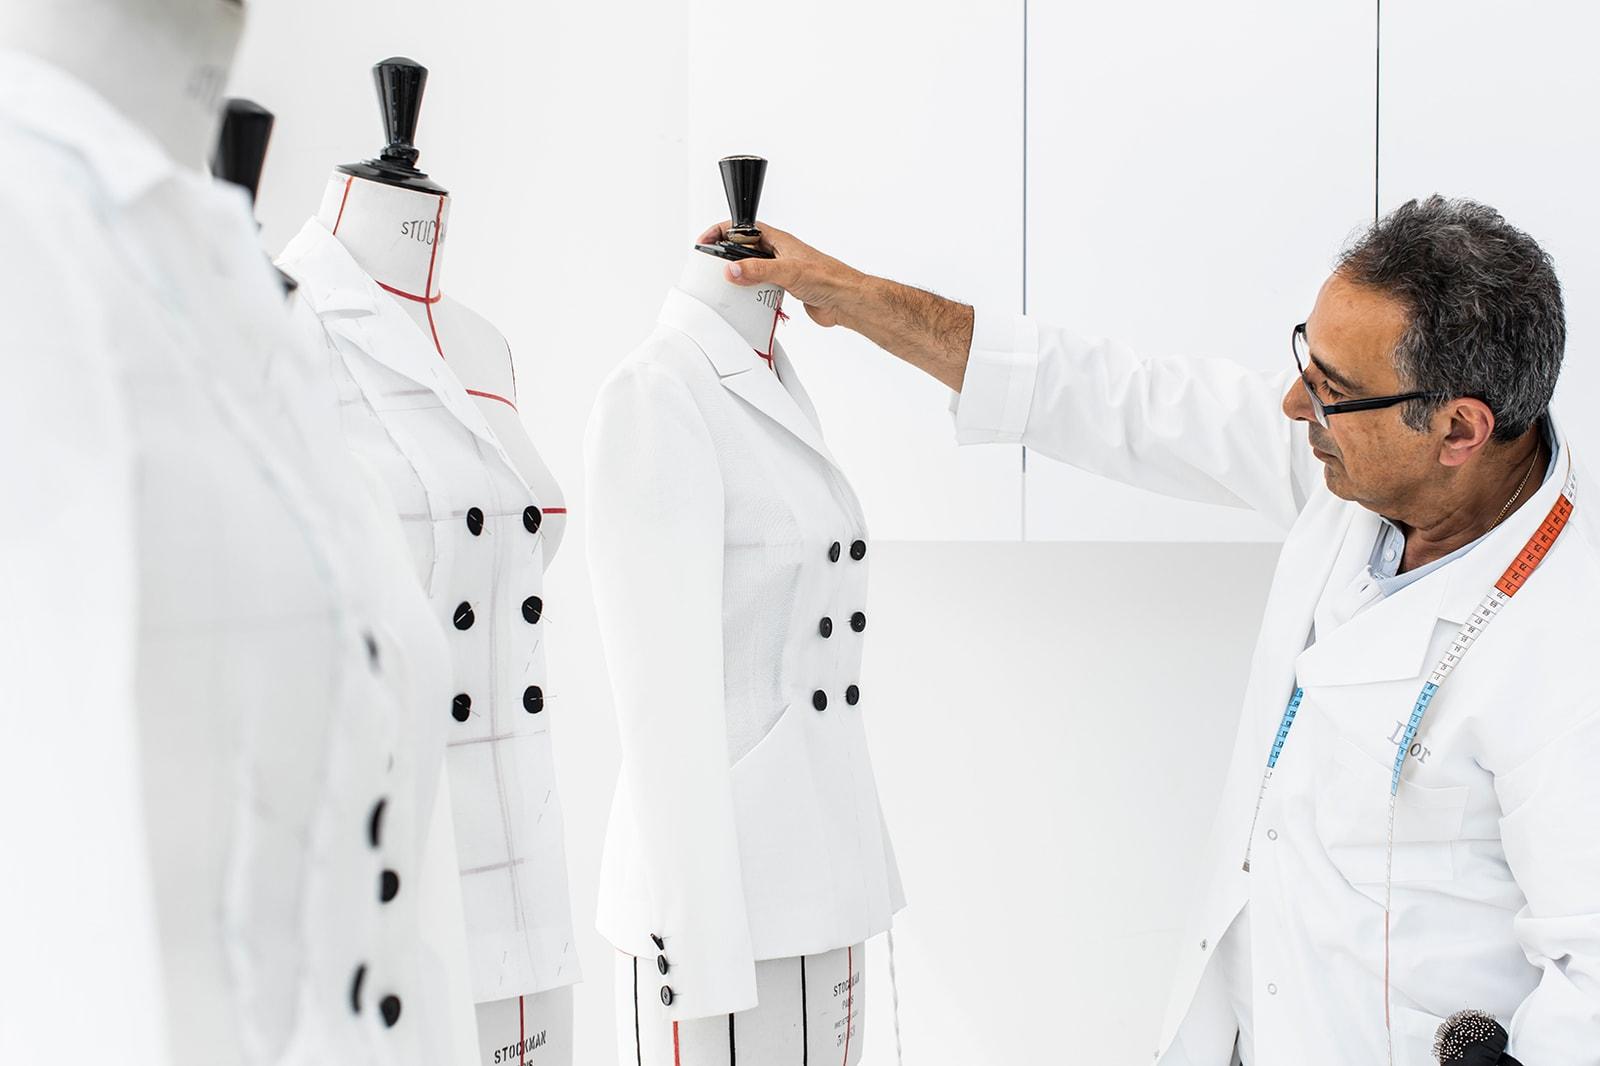 dior bar jacket womens how its made video designer